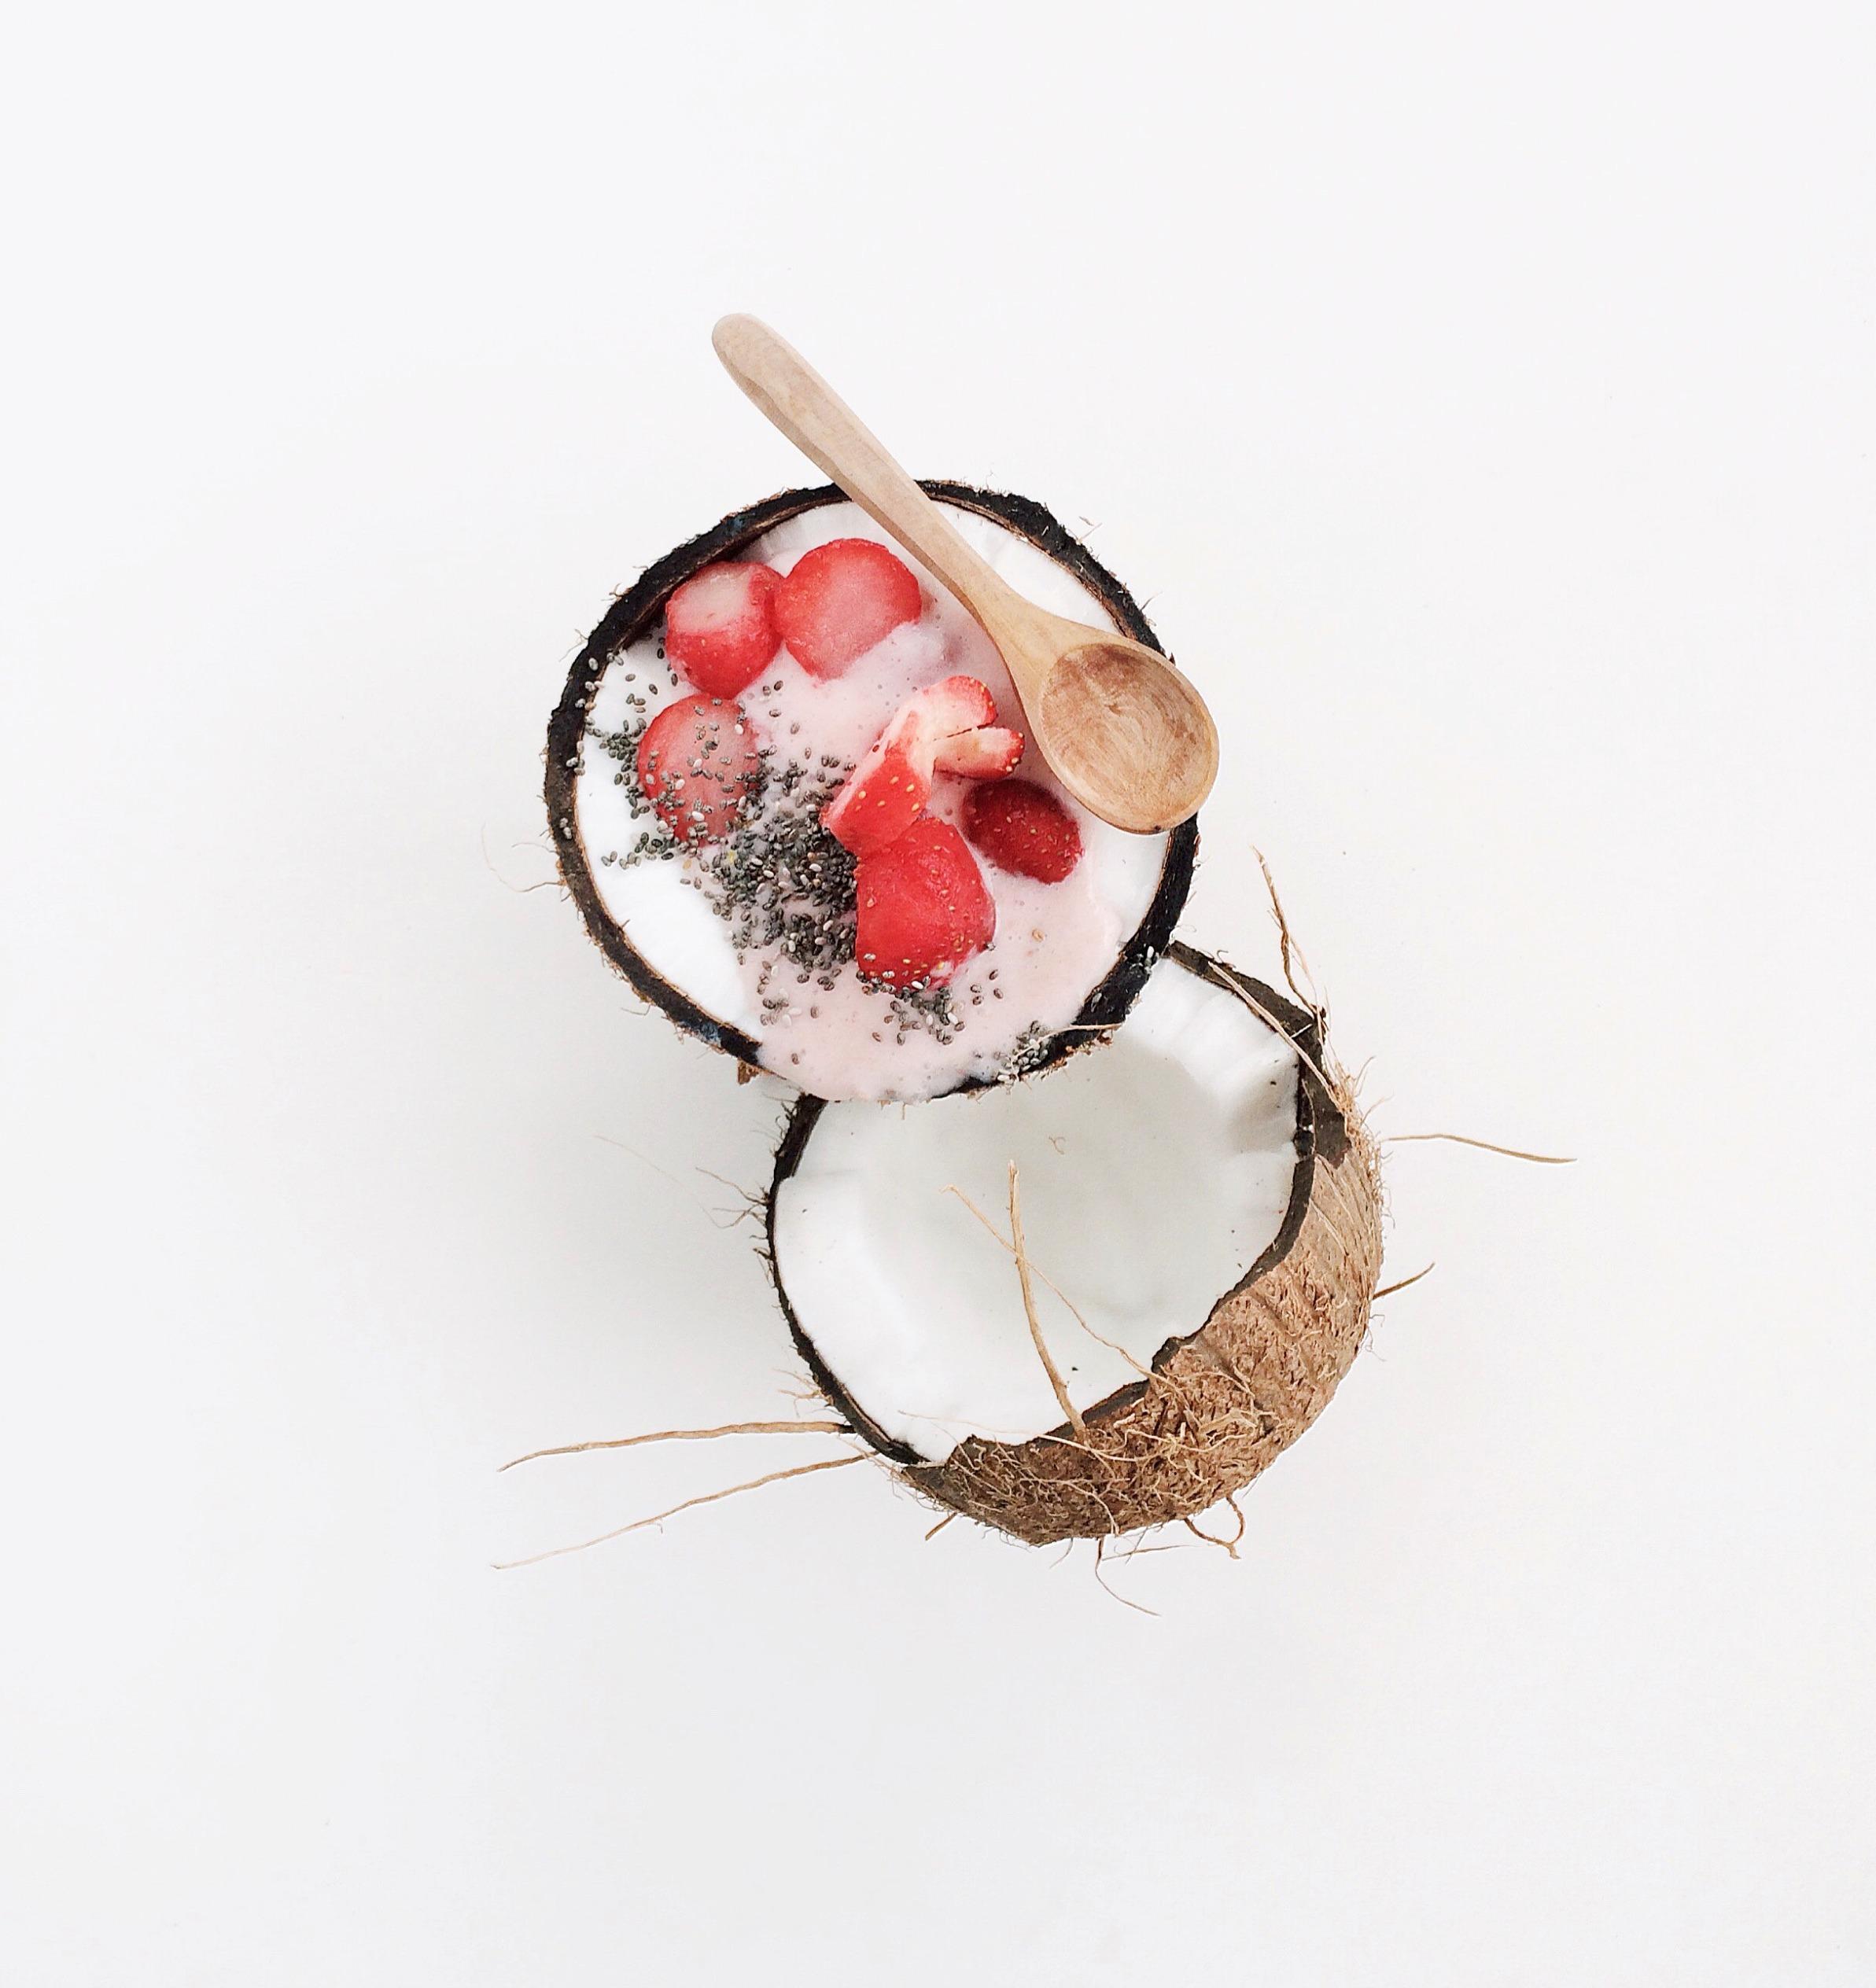 berries-berry-chia-1030973_edited.jpg